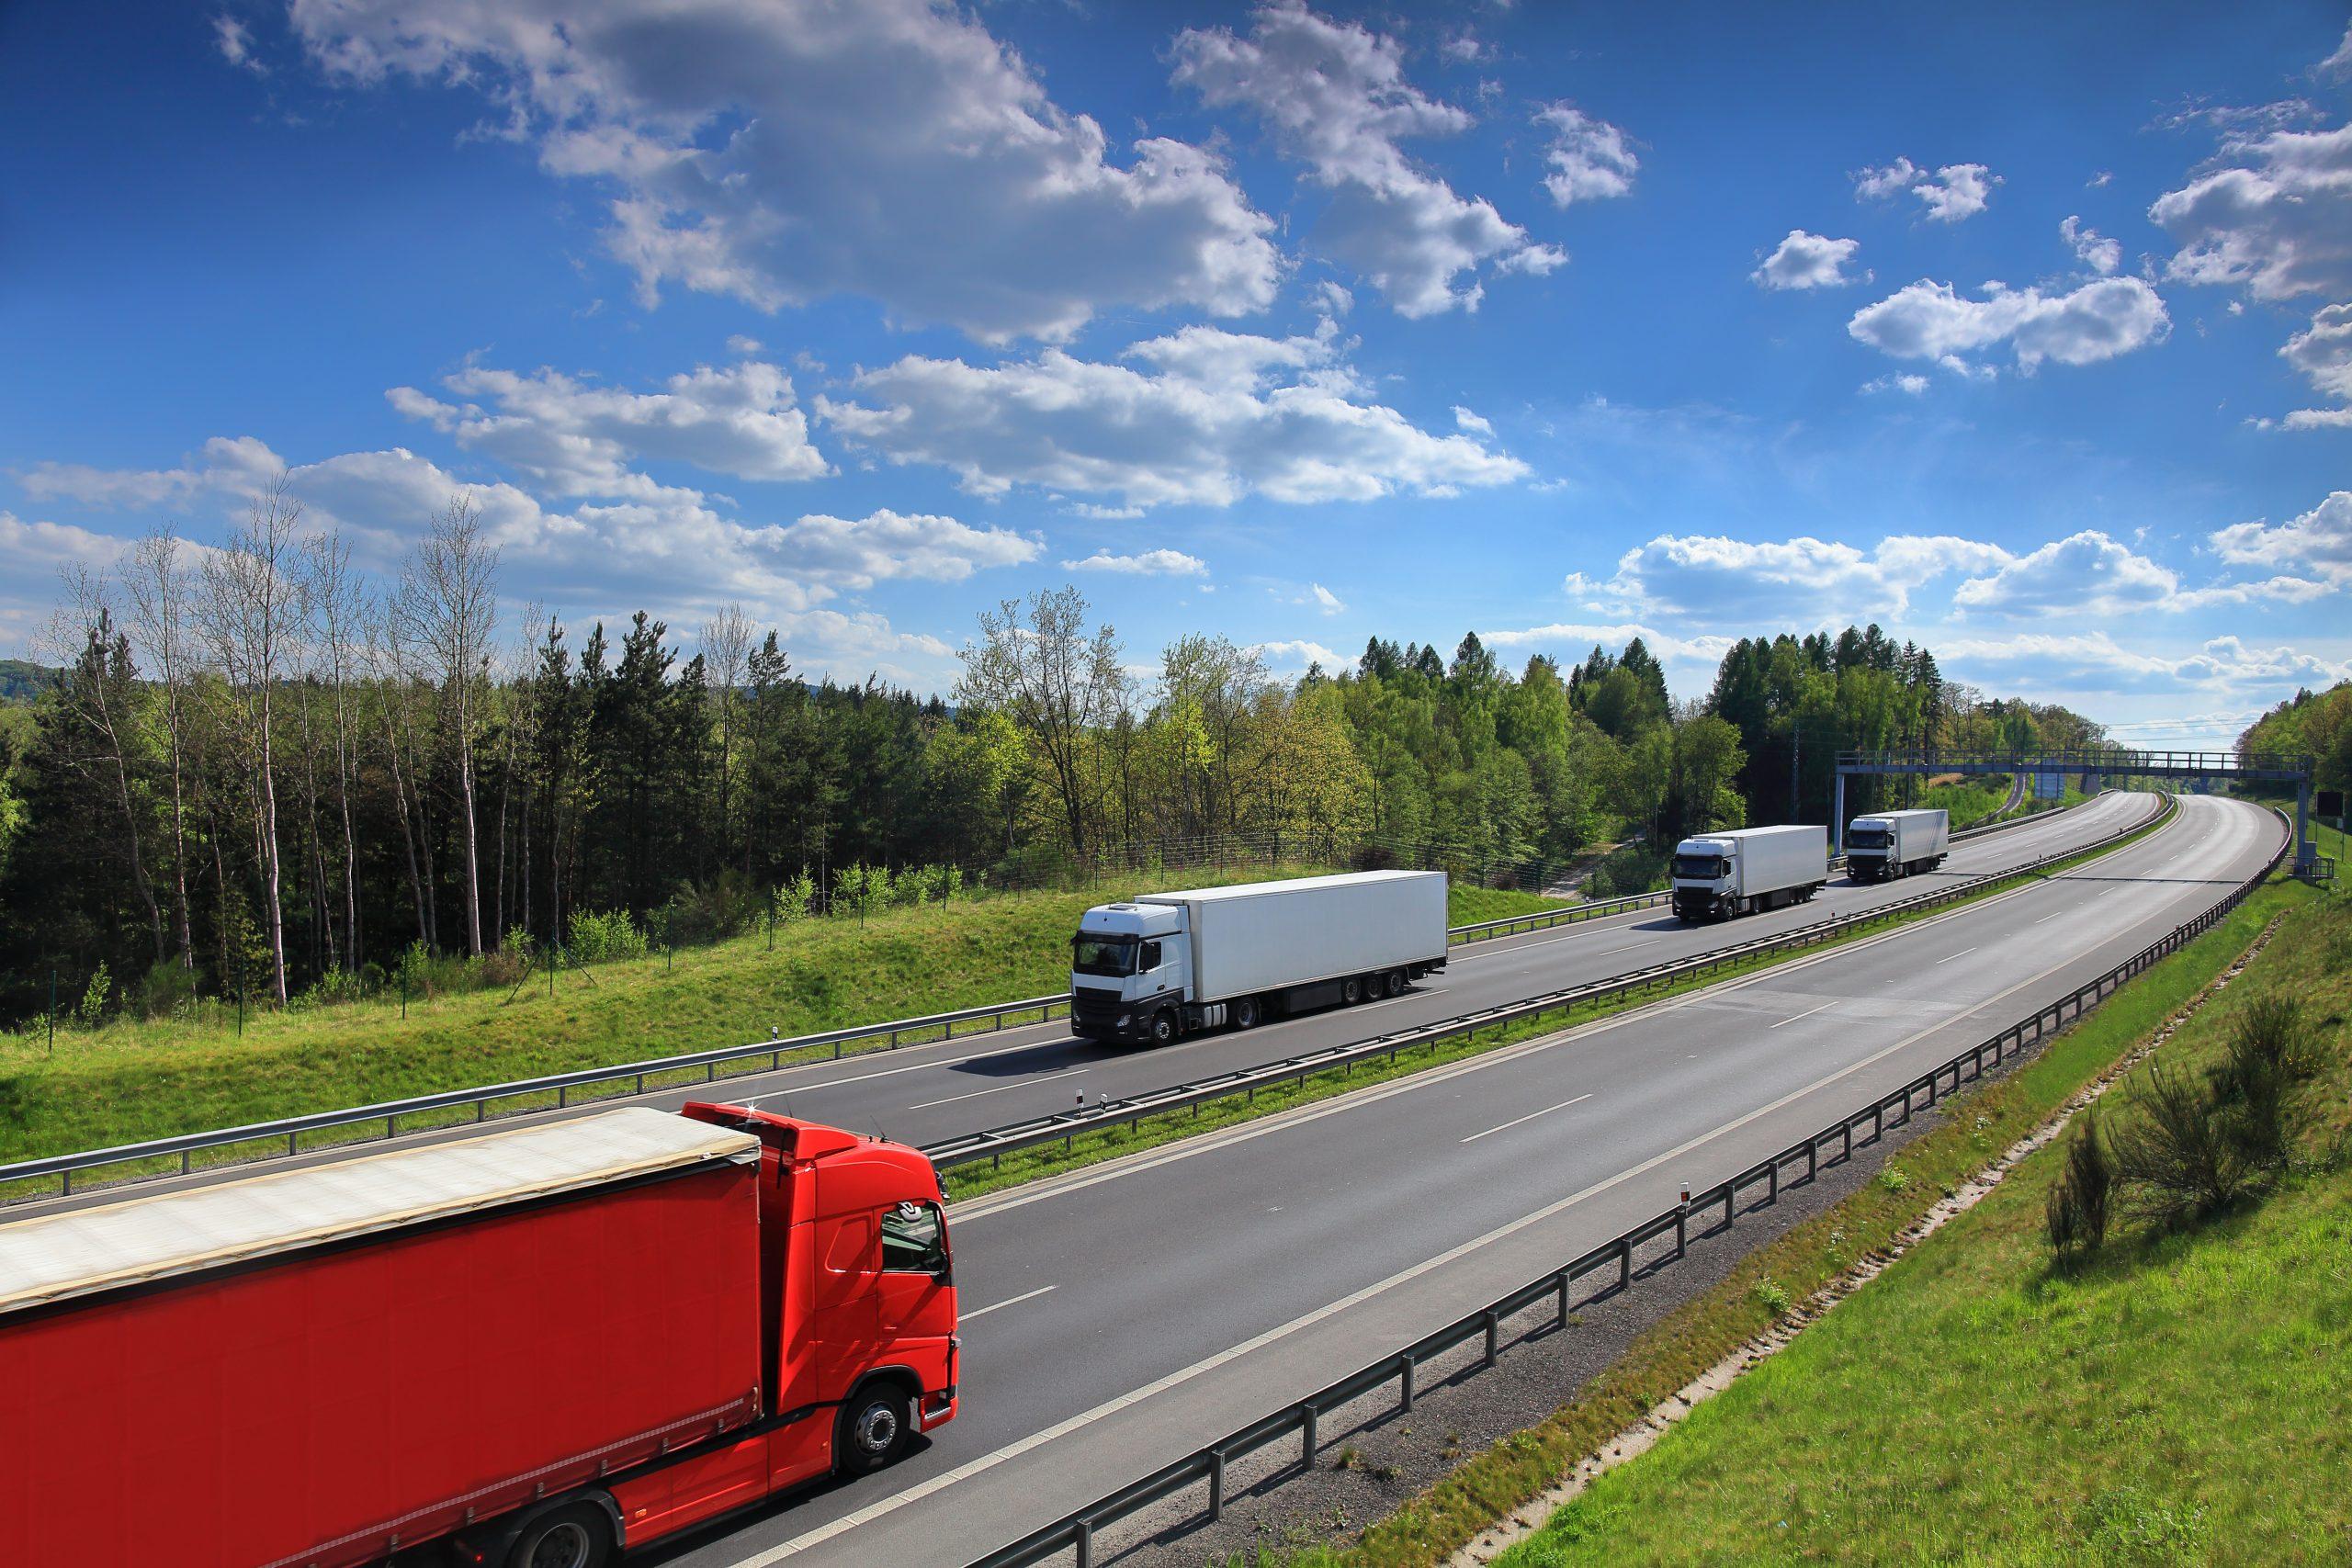 Trucks on motorway   wrong side, needs flipping